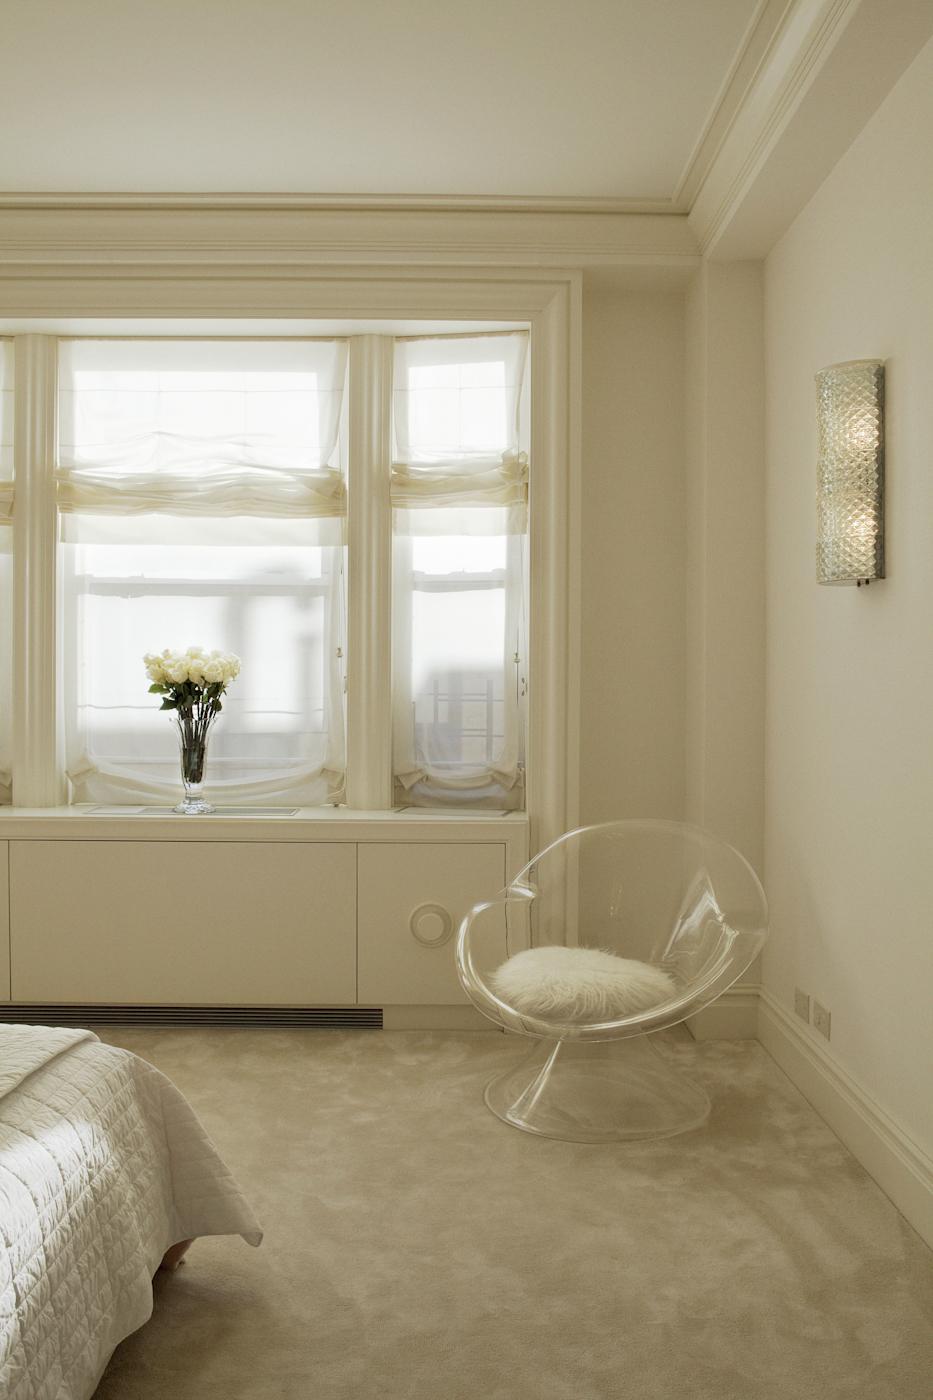 interior_ues2_10.jpg